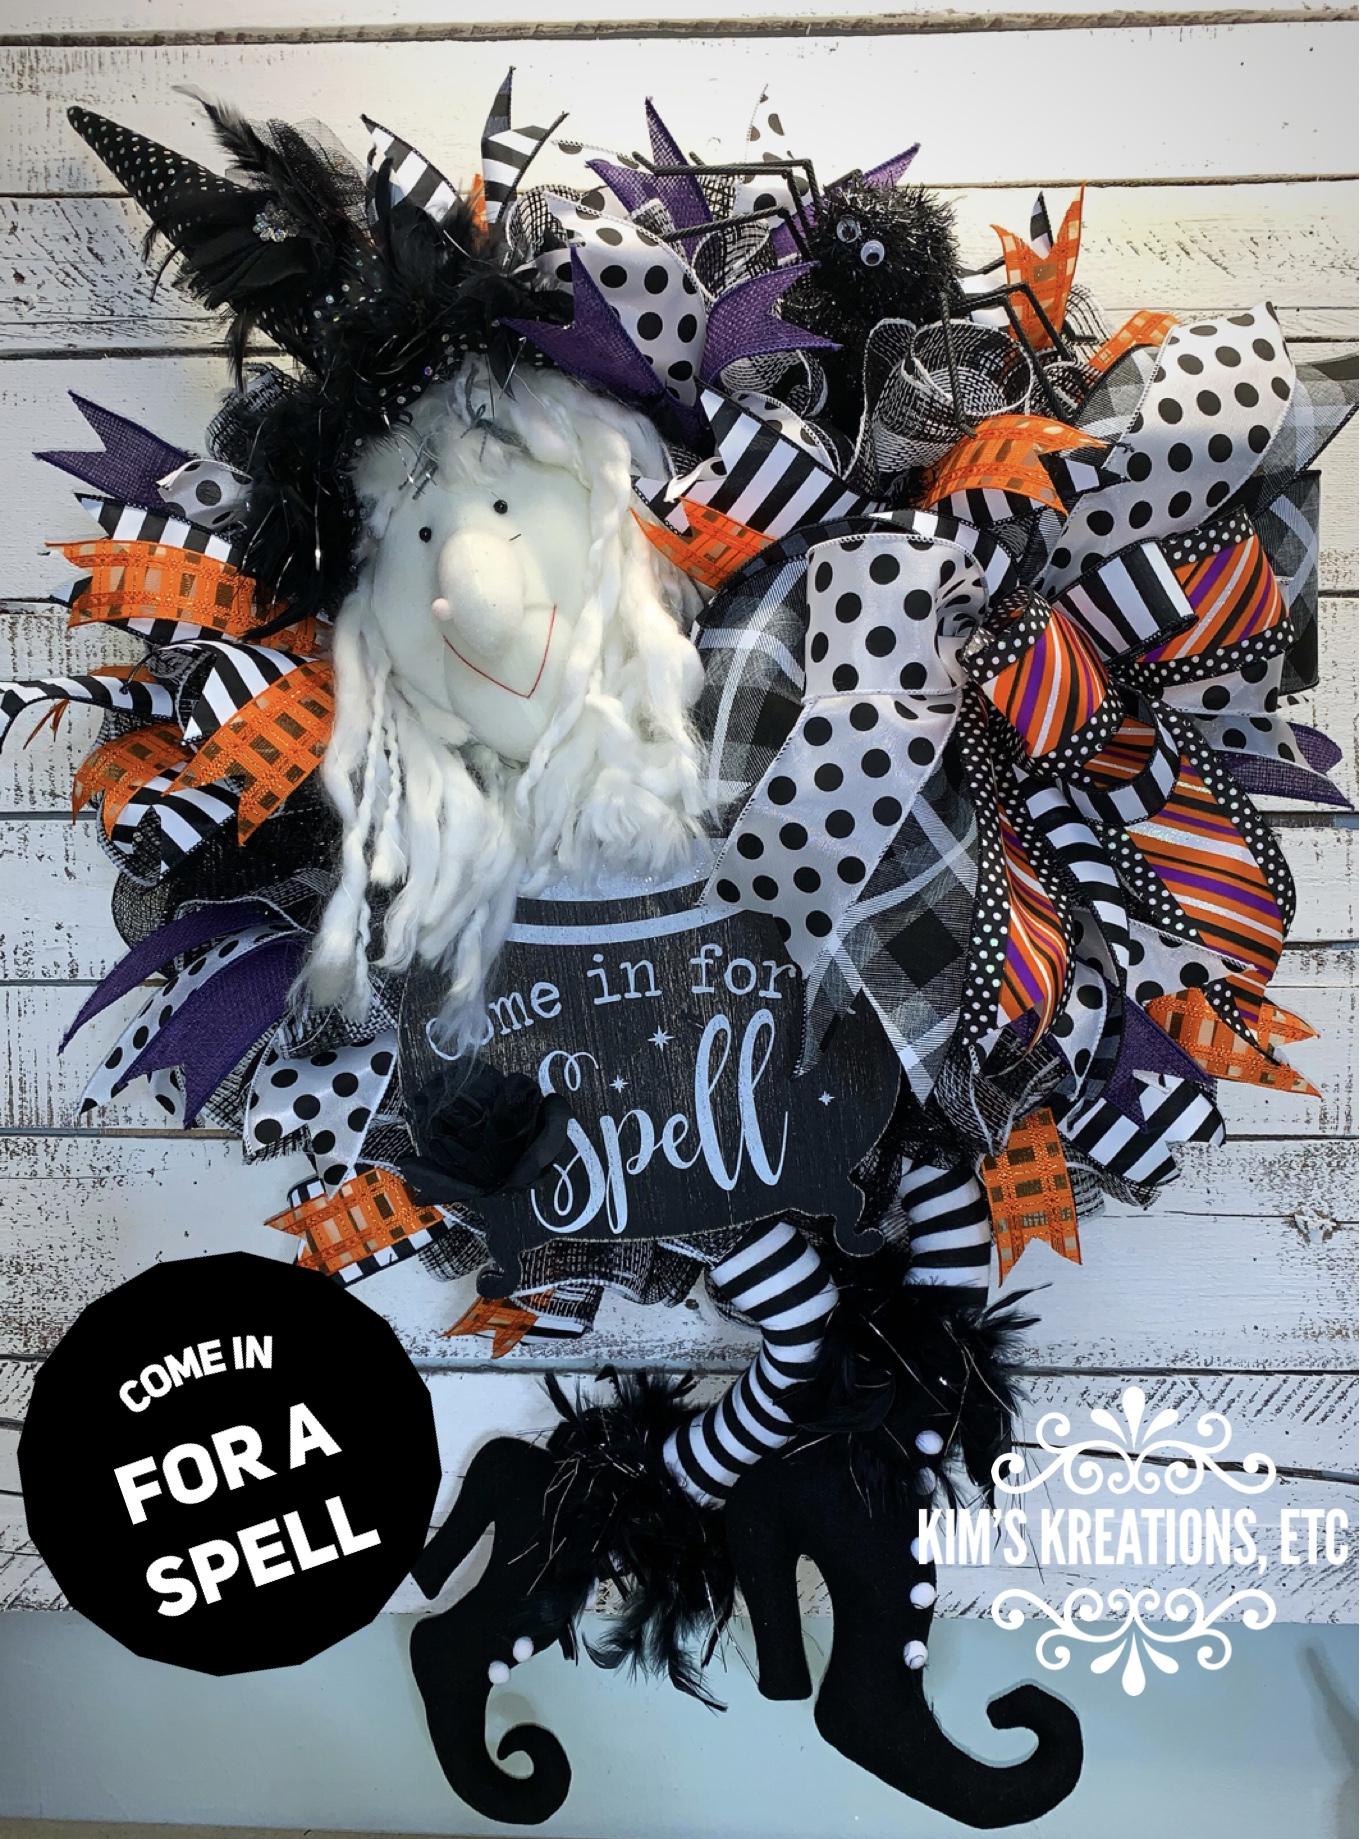 Halloween Wreath Free Shipping Halloween Witch Wreath Witch Wreath For Halloween Black And White Halloween Wreath Halloween Decor Large Halloween Wreath Home Decor Wreaths For Sale Hand Made Wreaths Kim S Kreations